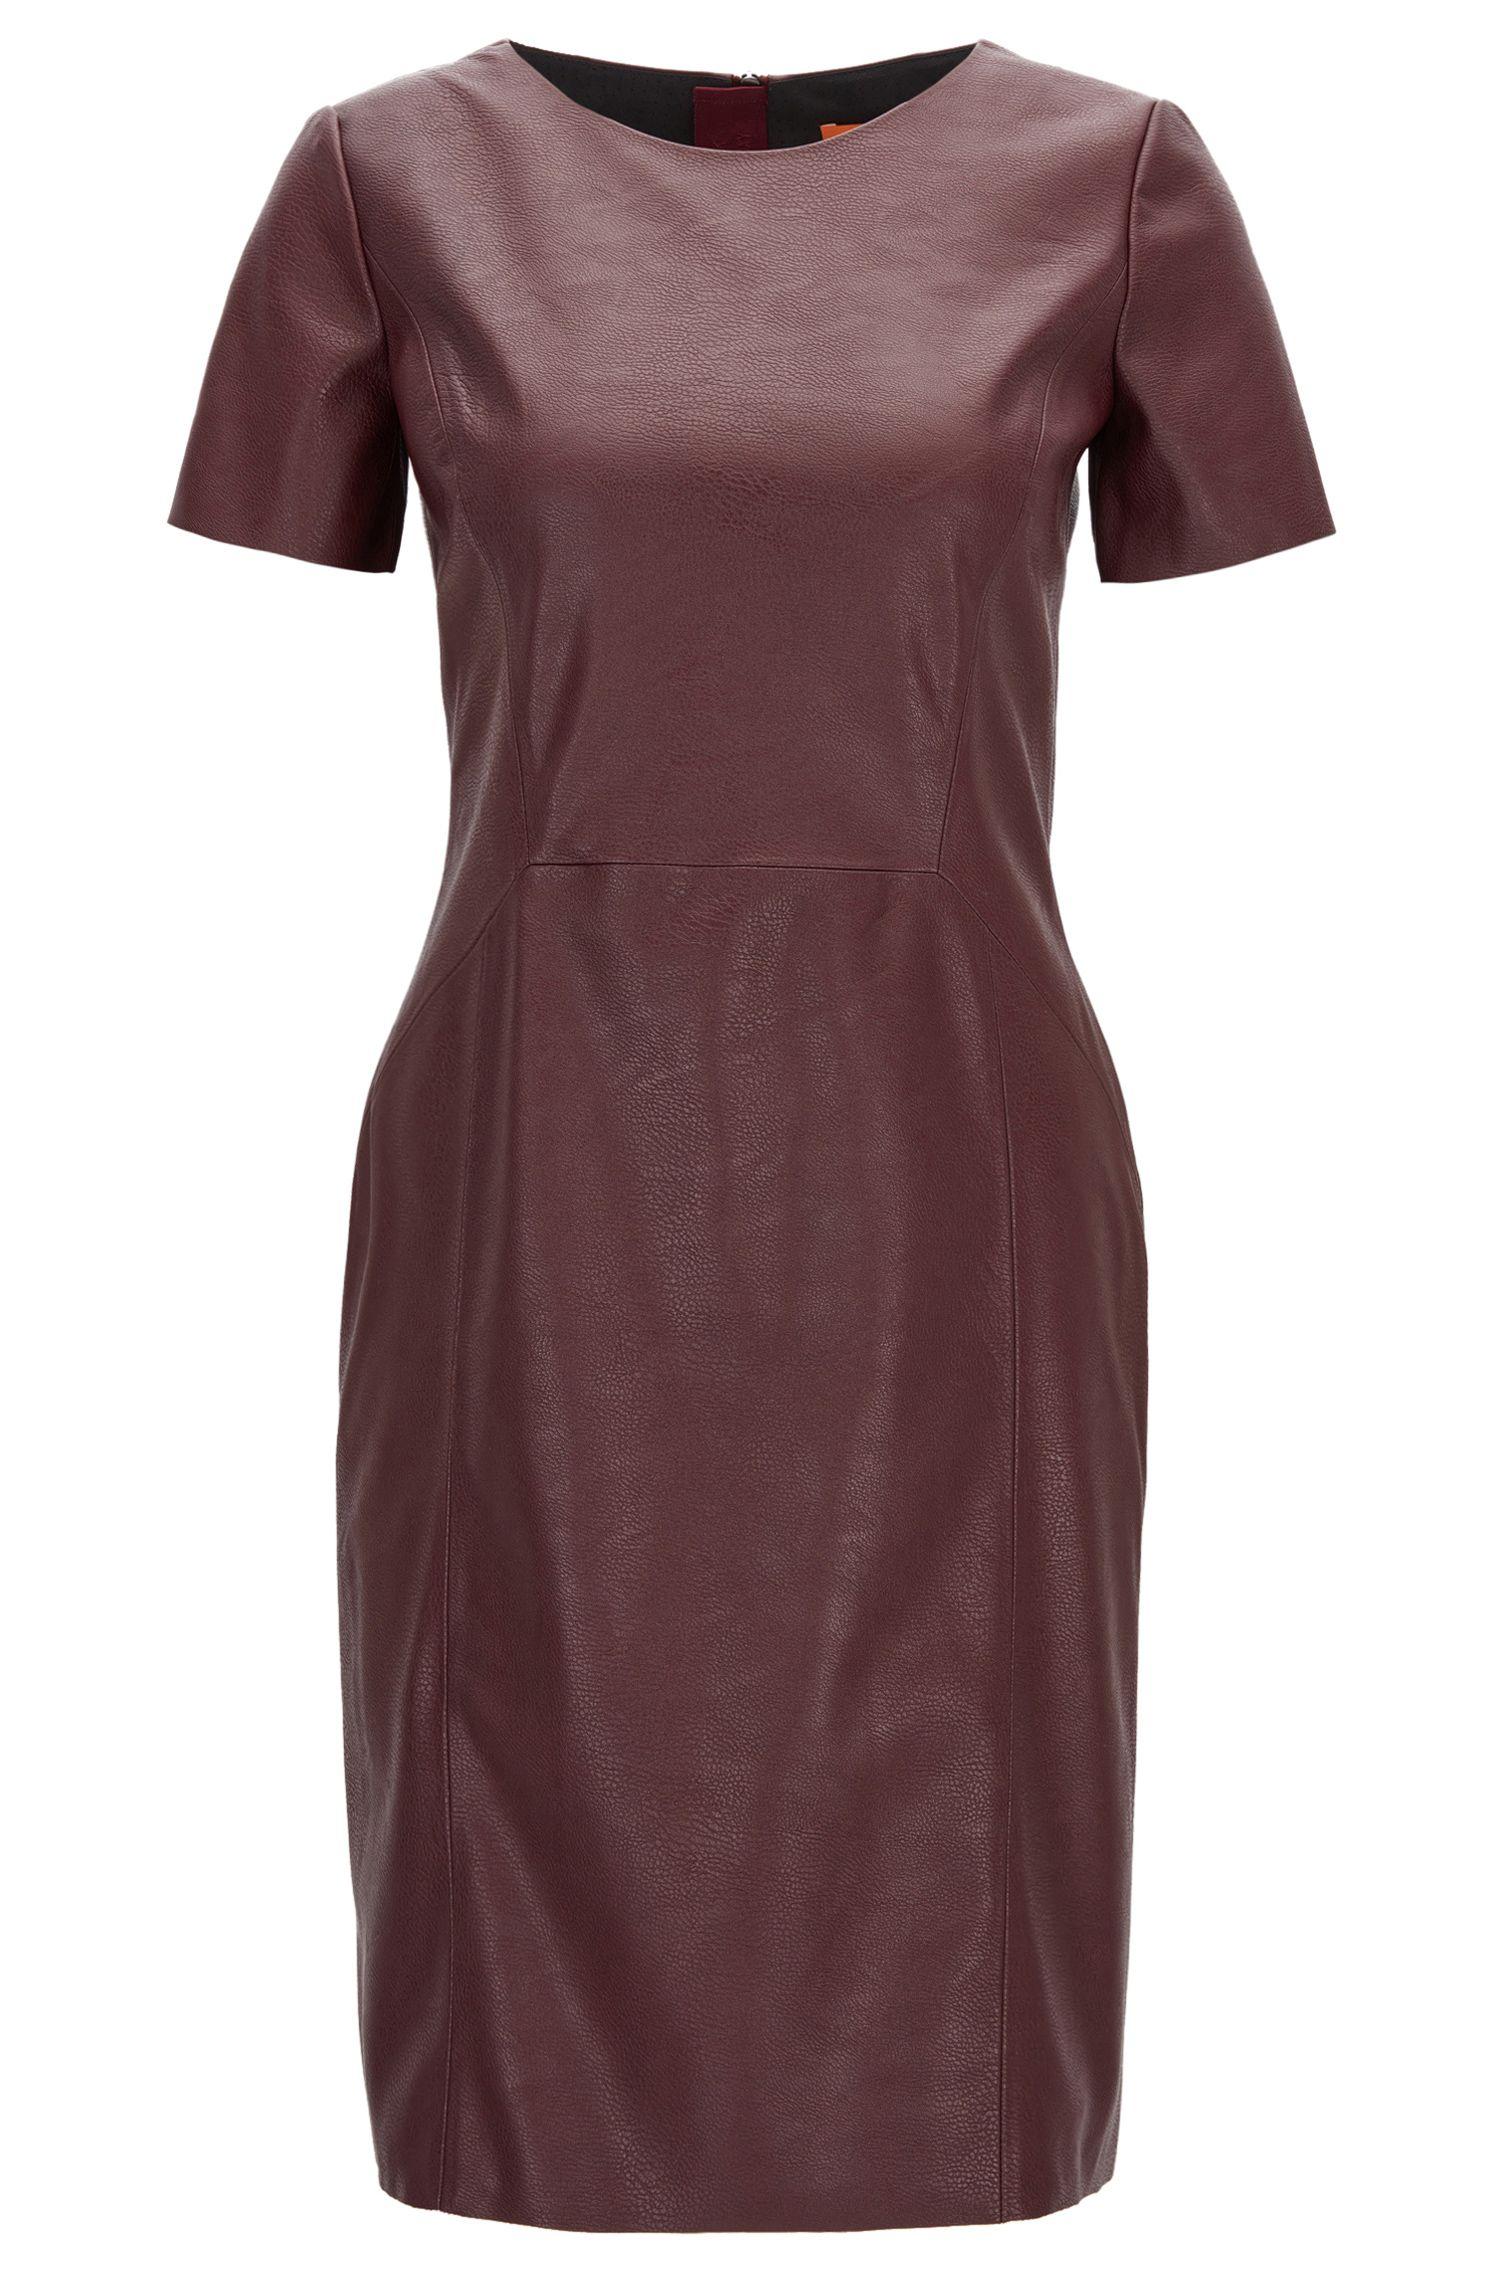 Faux Leather Sheath Dress | Aledy